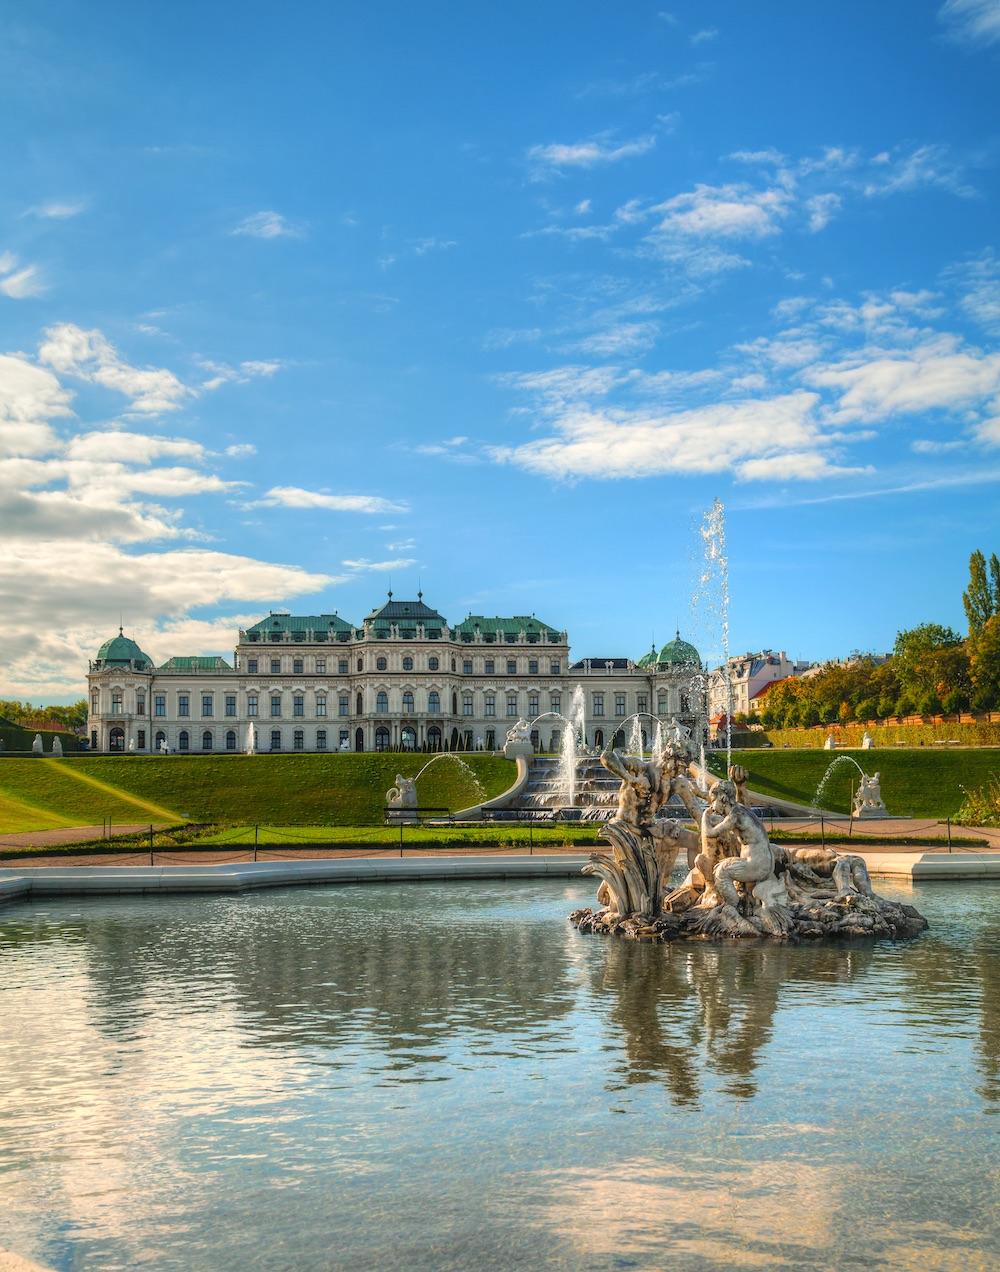 CC_Vienna_Belvedere_Palace_Fountains.jpg